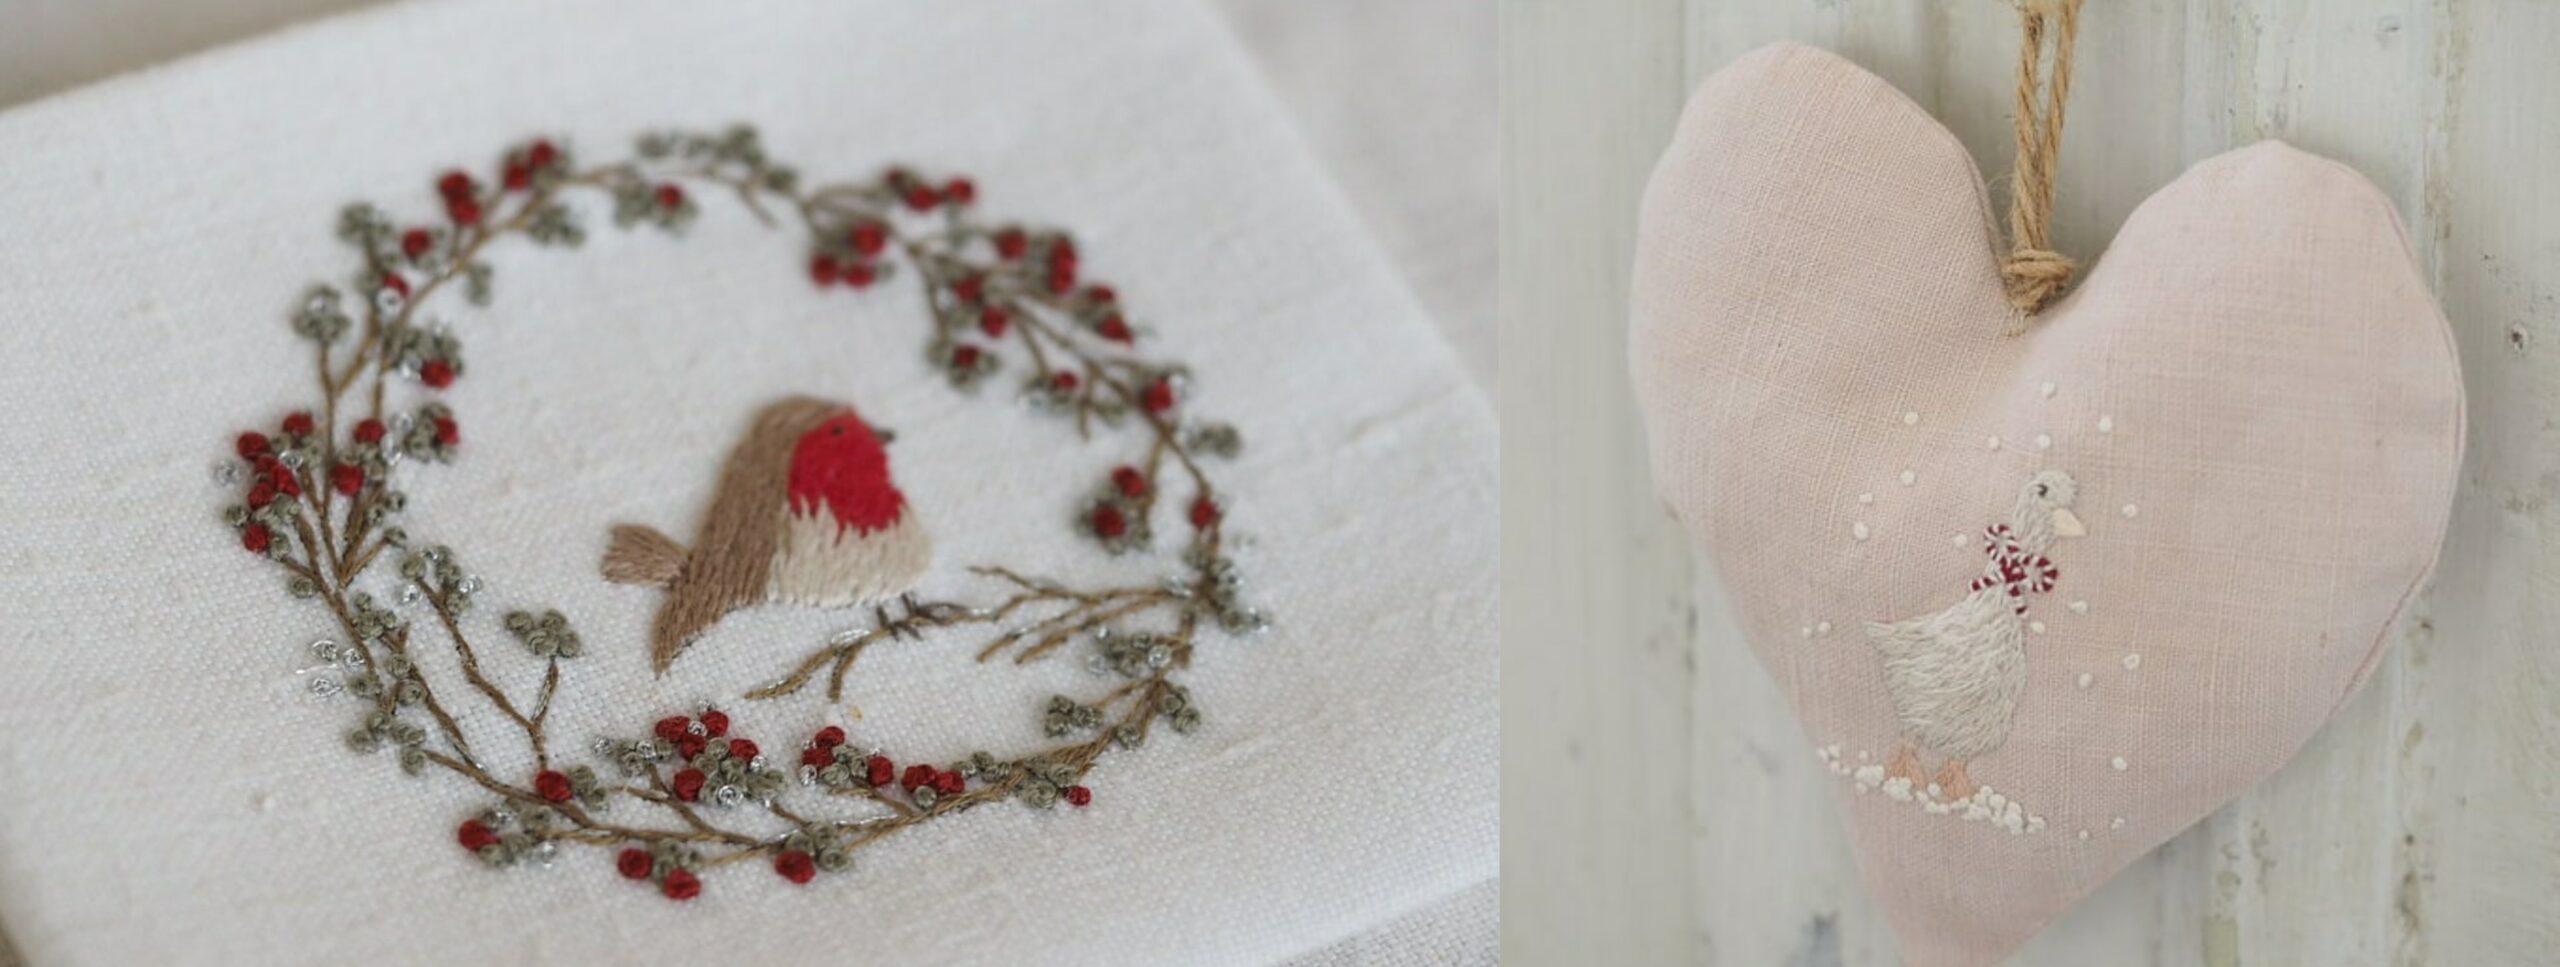 The Stitchery Christmas 2021